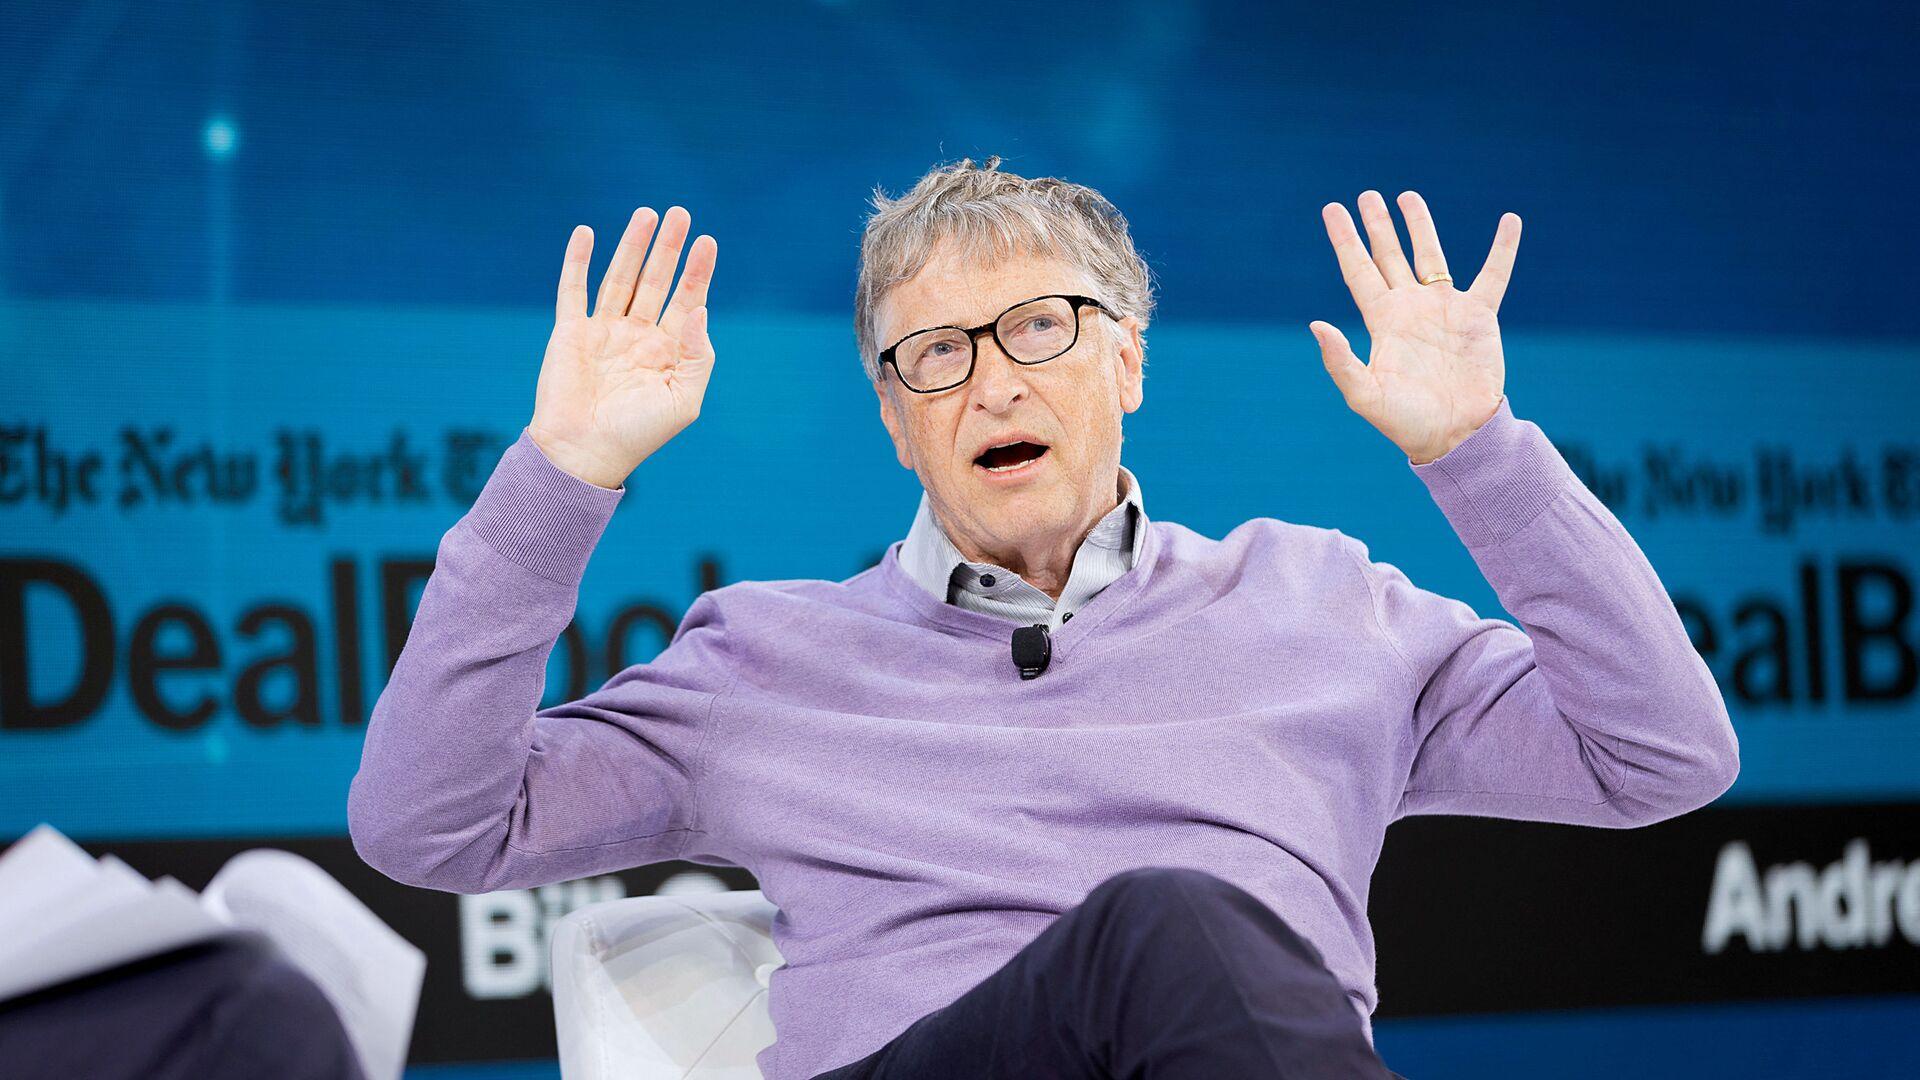 Bill Gates, Co-Chair, Bill & Melinda Gates Foundation speaks onstage at 2019 New York Times Dealbook on 6 November 2019 in New York City. - Sputnik International, 1920, 05.08.2021